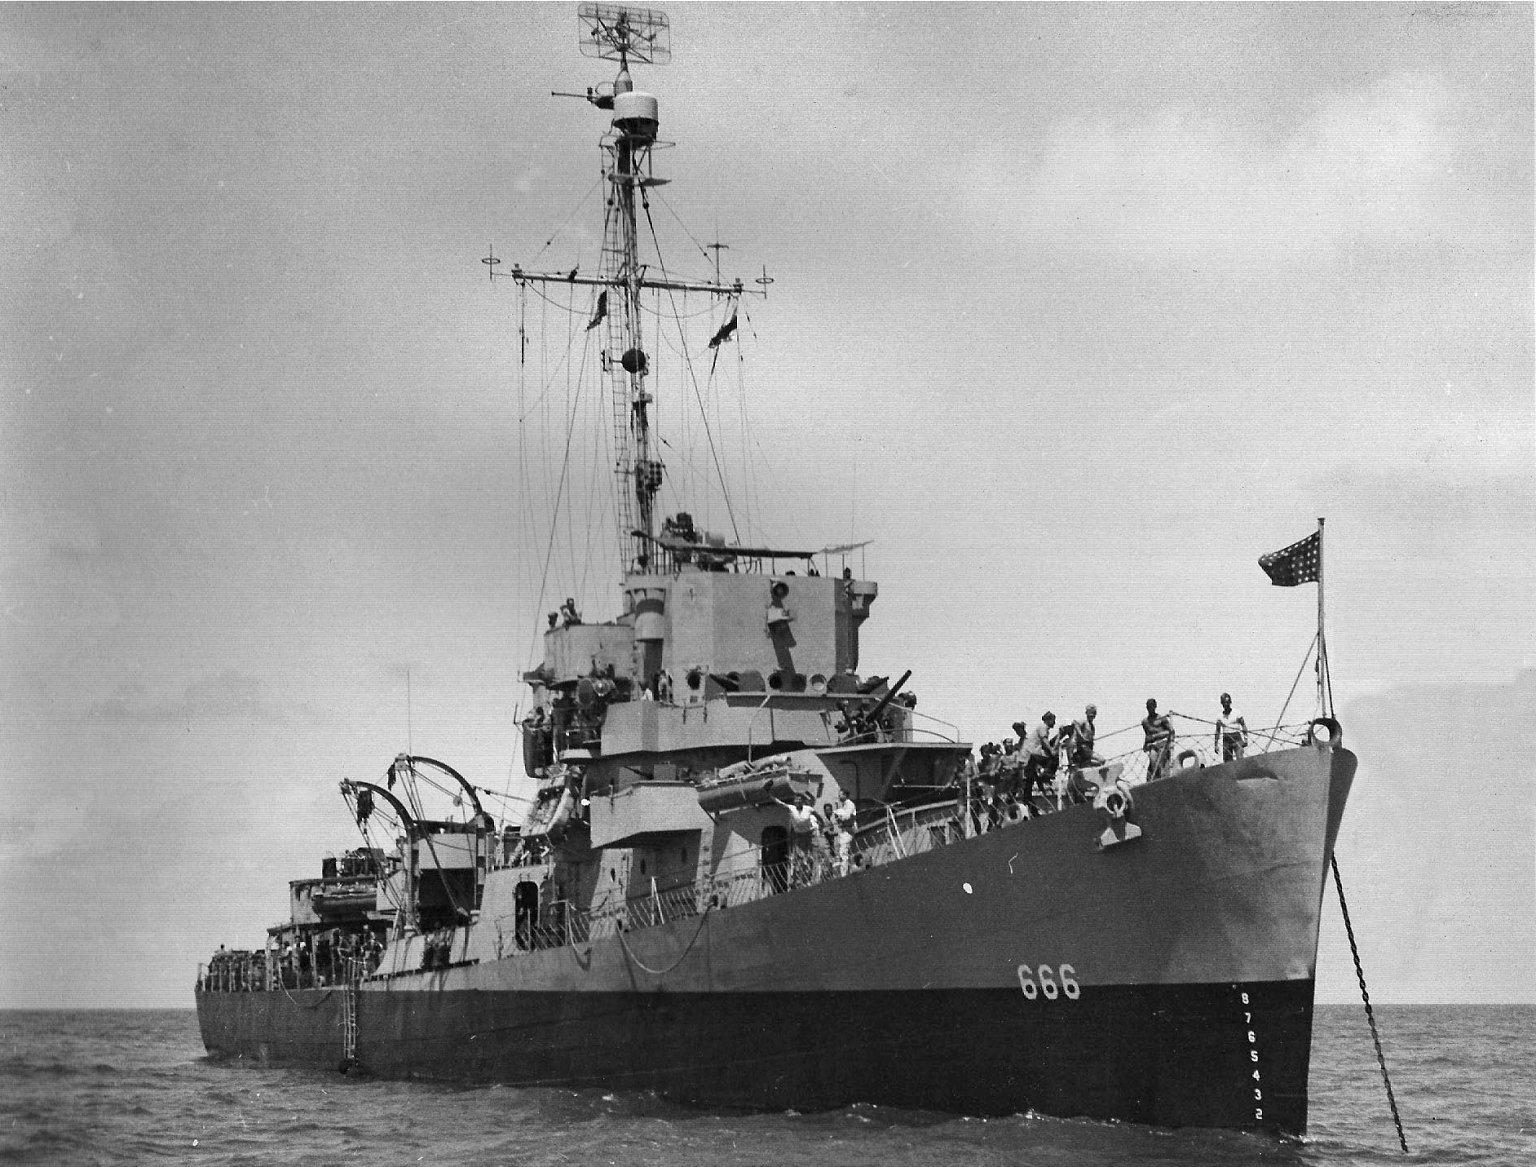 USS Durik (DE-666) at anchor off Norfolk, Virginia (USA), on 31 December 1944.jpg